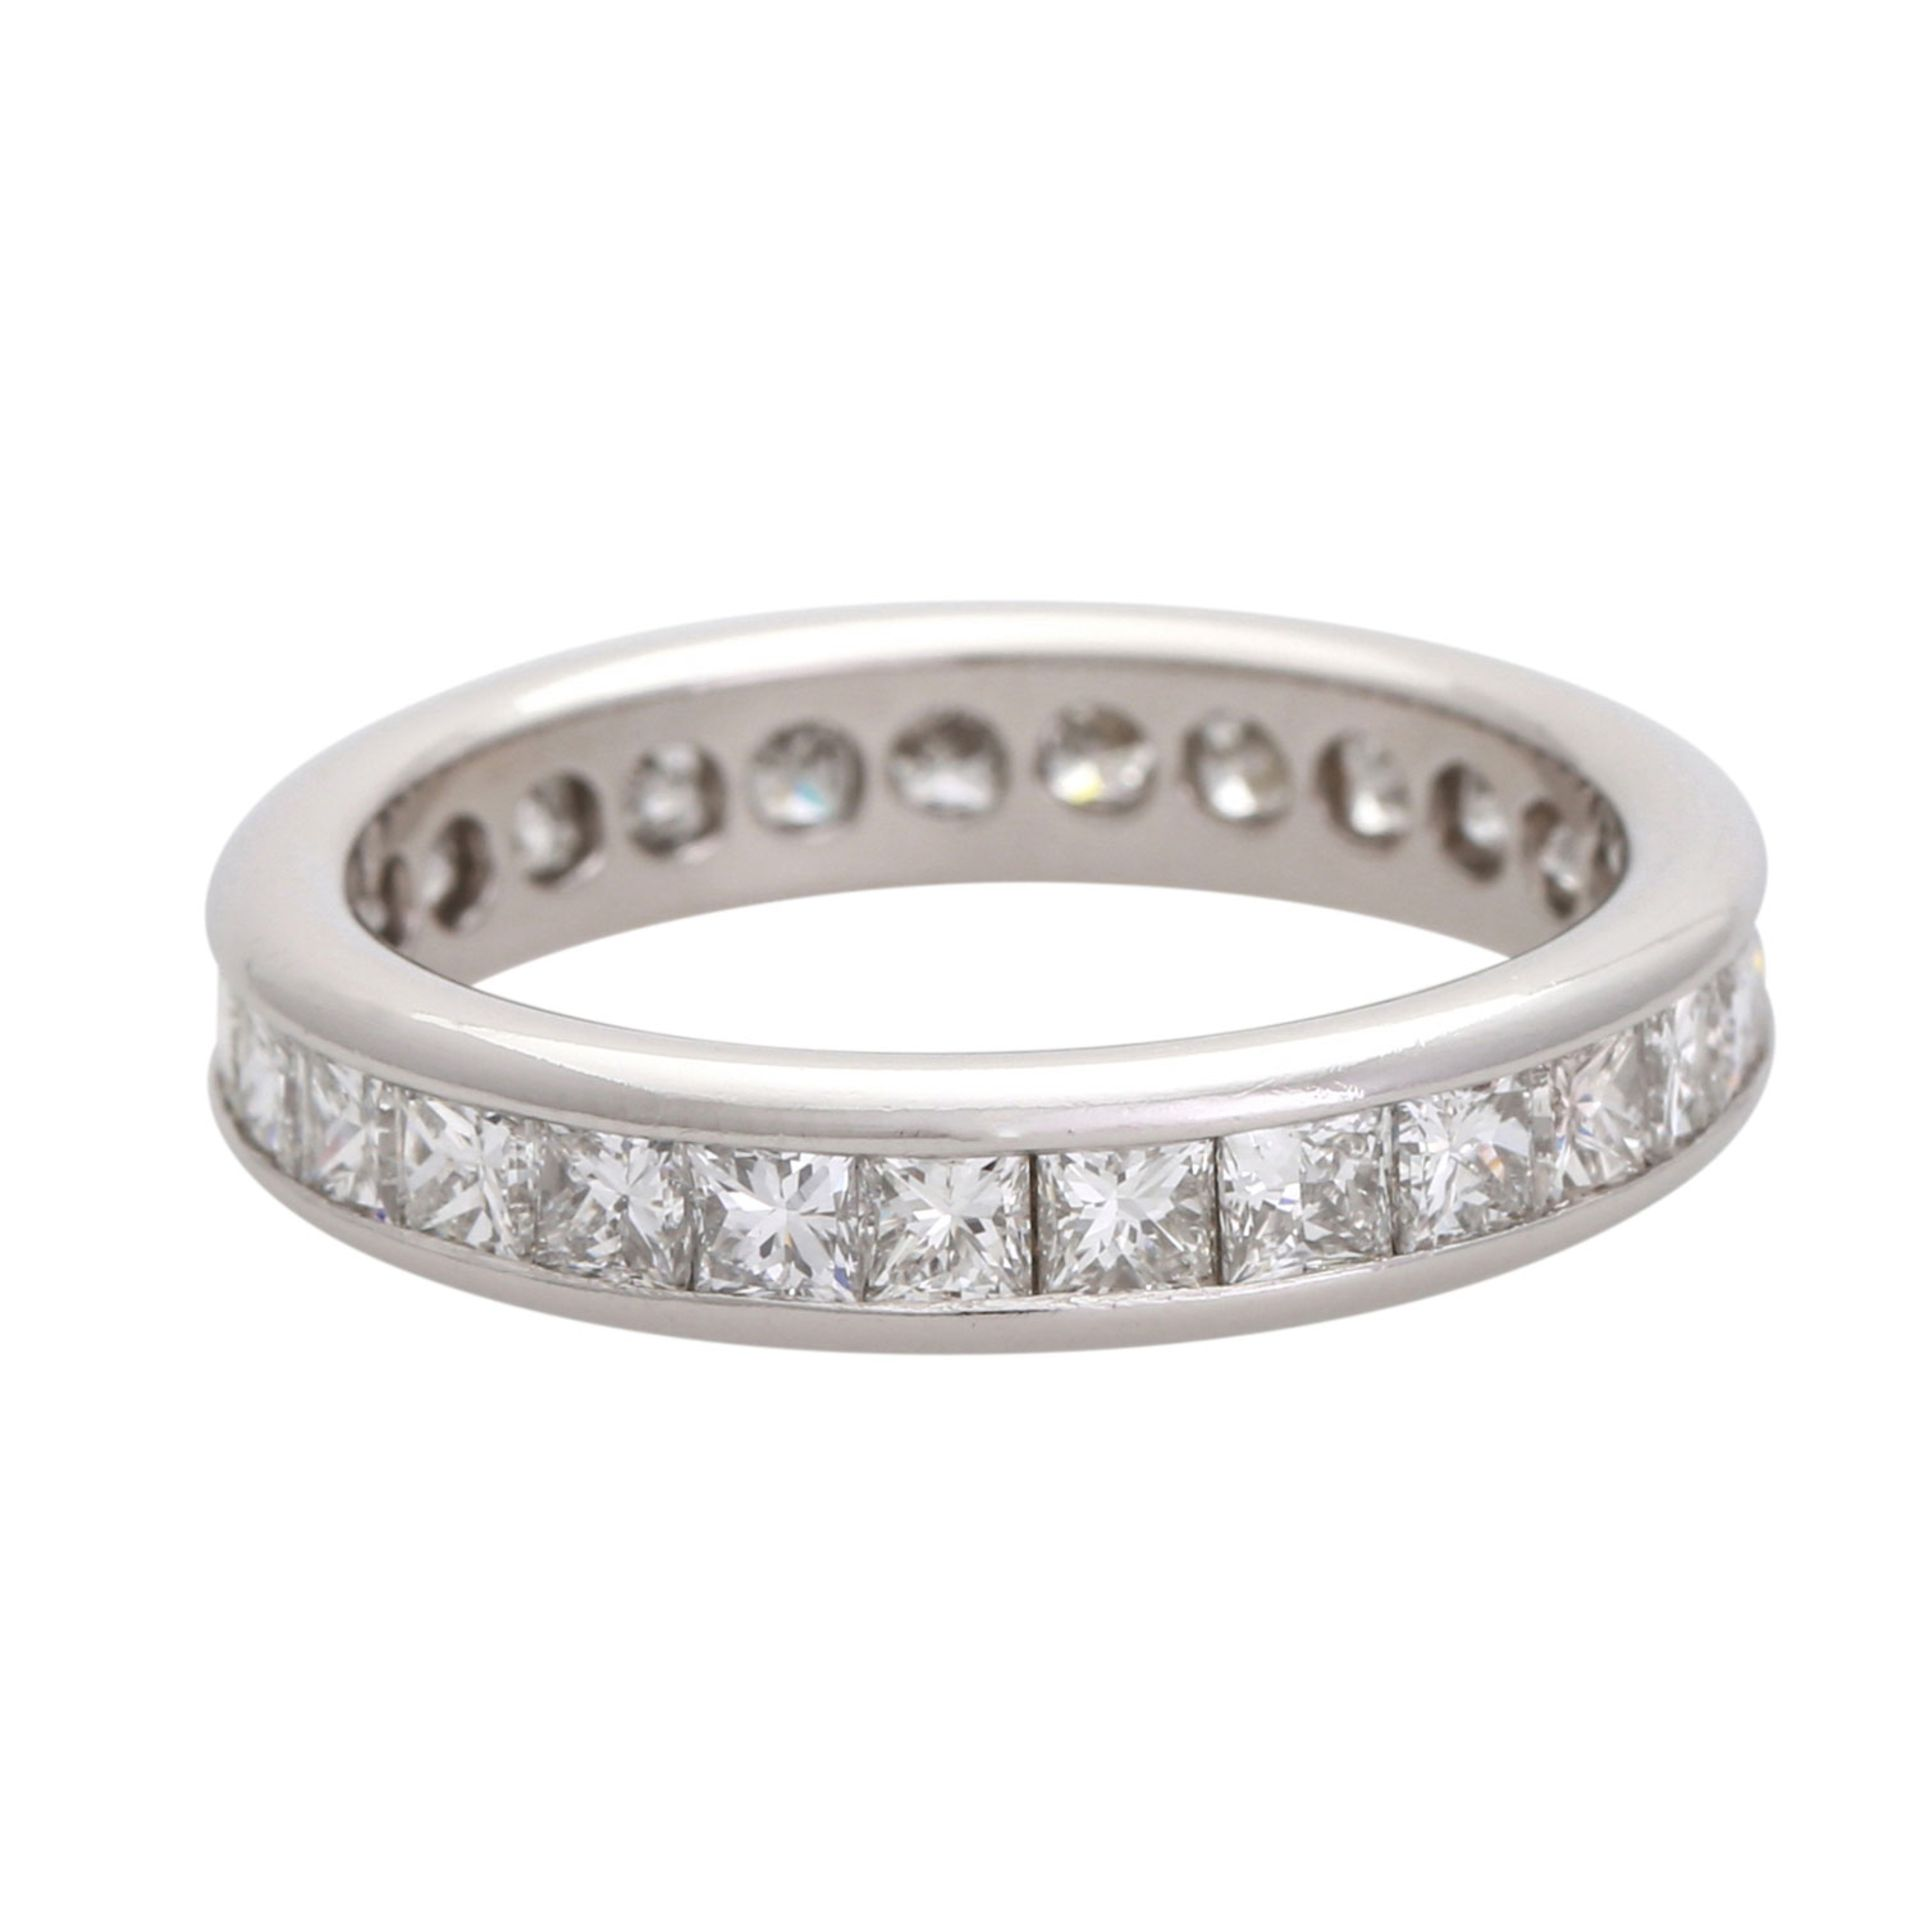 Los 25 - Memoire Ring mit Princess Cut Diamanten. Platin, CHRISTIAN BAUER, Dia. zus. 2,82 ct, TW (G) - SI